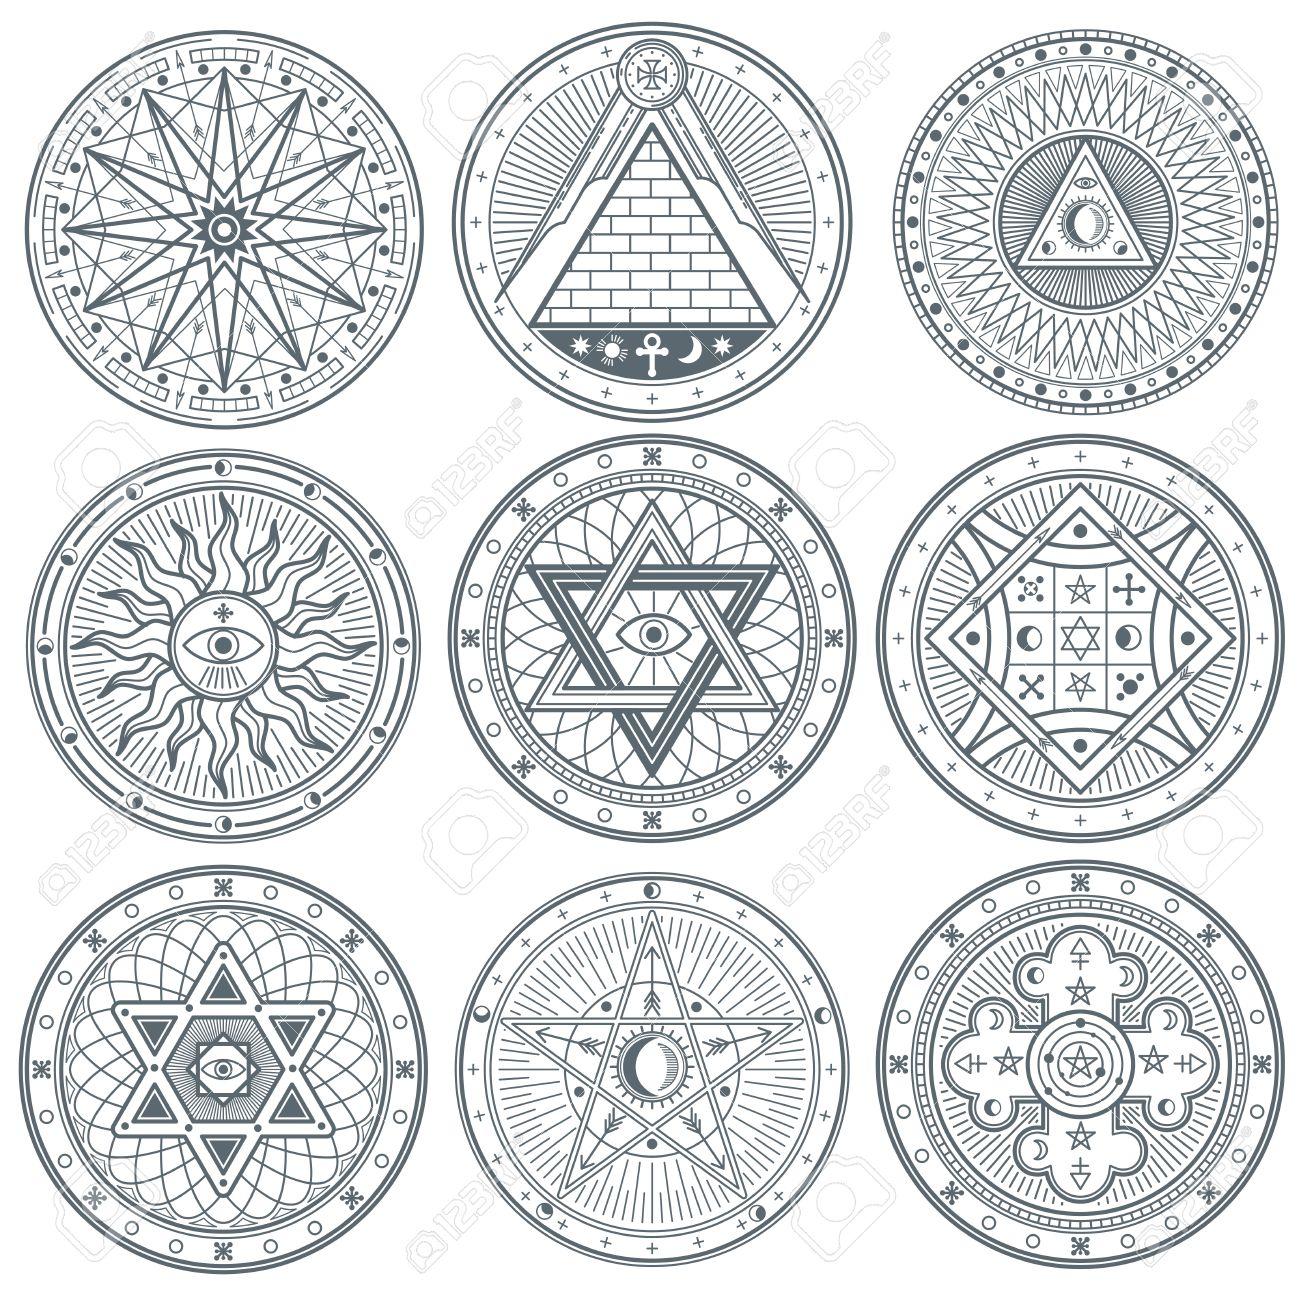 Mystery witchcraft occult alchemy mystical vintage gothic mystery witchcraft occult alchemy mystical vintage gothic vector tattoo symbols mystical biocorpaavc